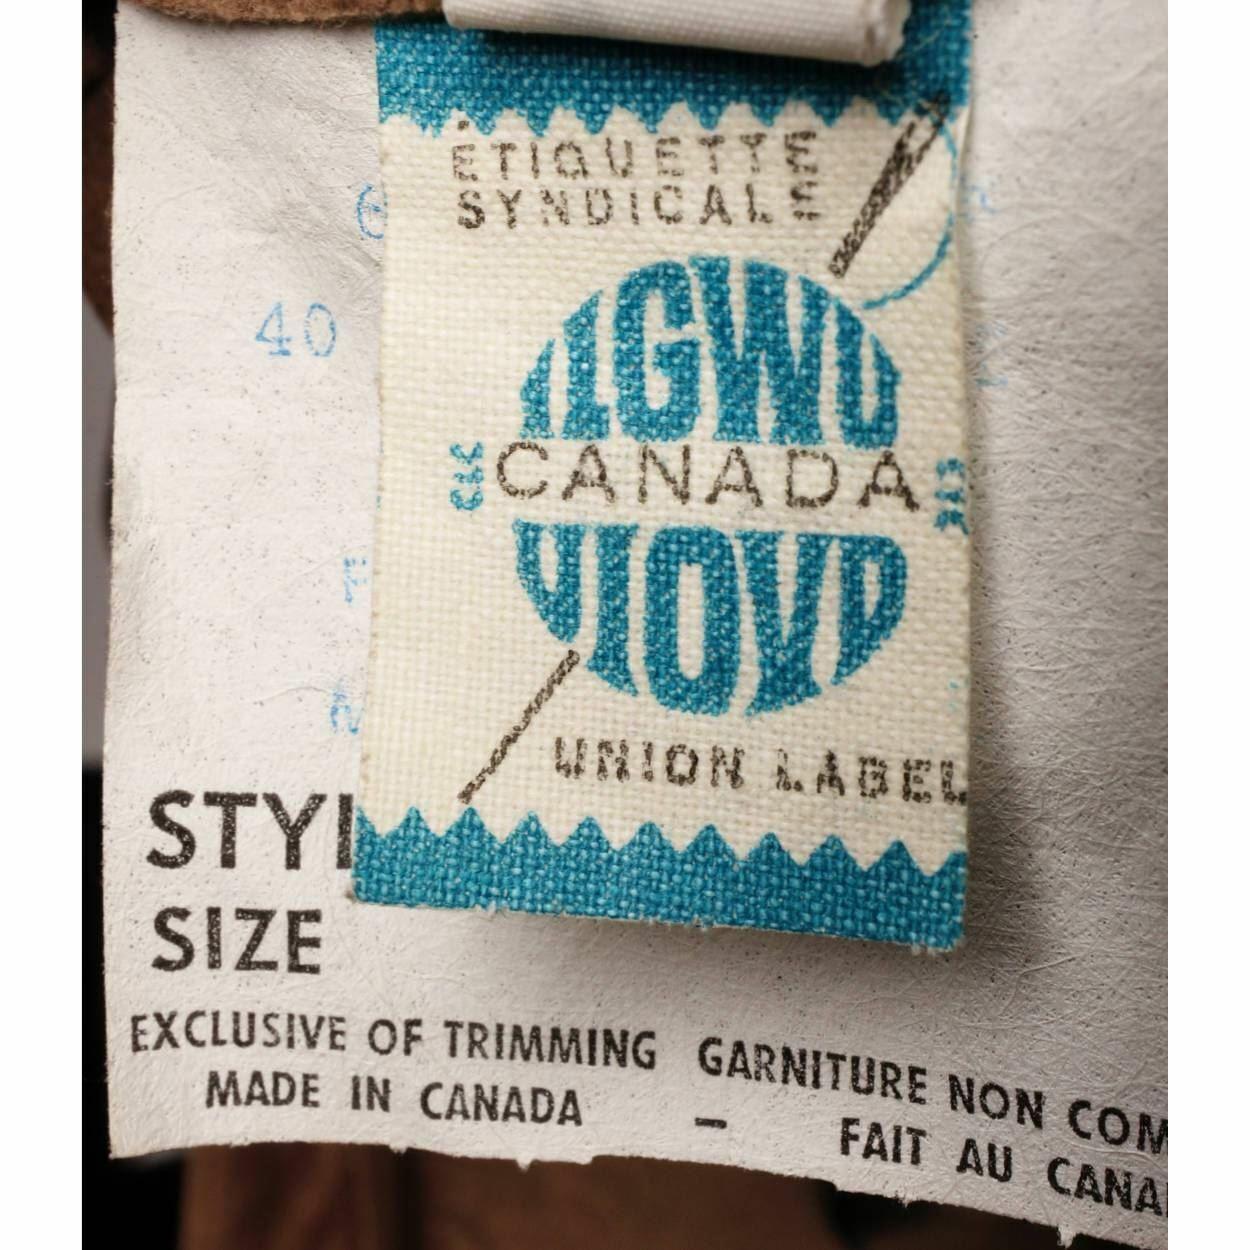 Vintage 1970s Halston Ultrasuede Taupe Maxi Skirt - image 6